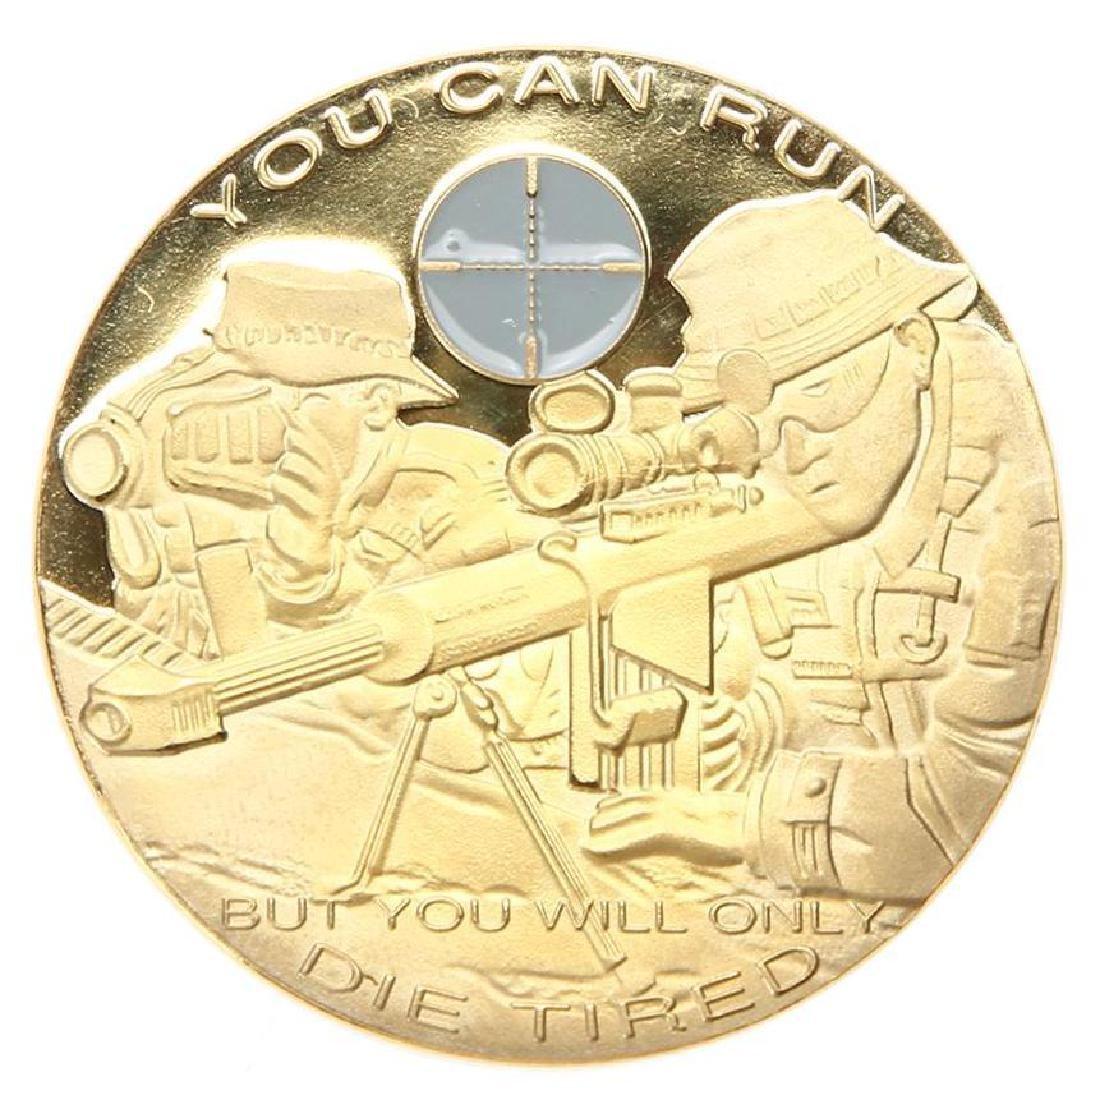 War Sniper Military Challenge Coin - 2